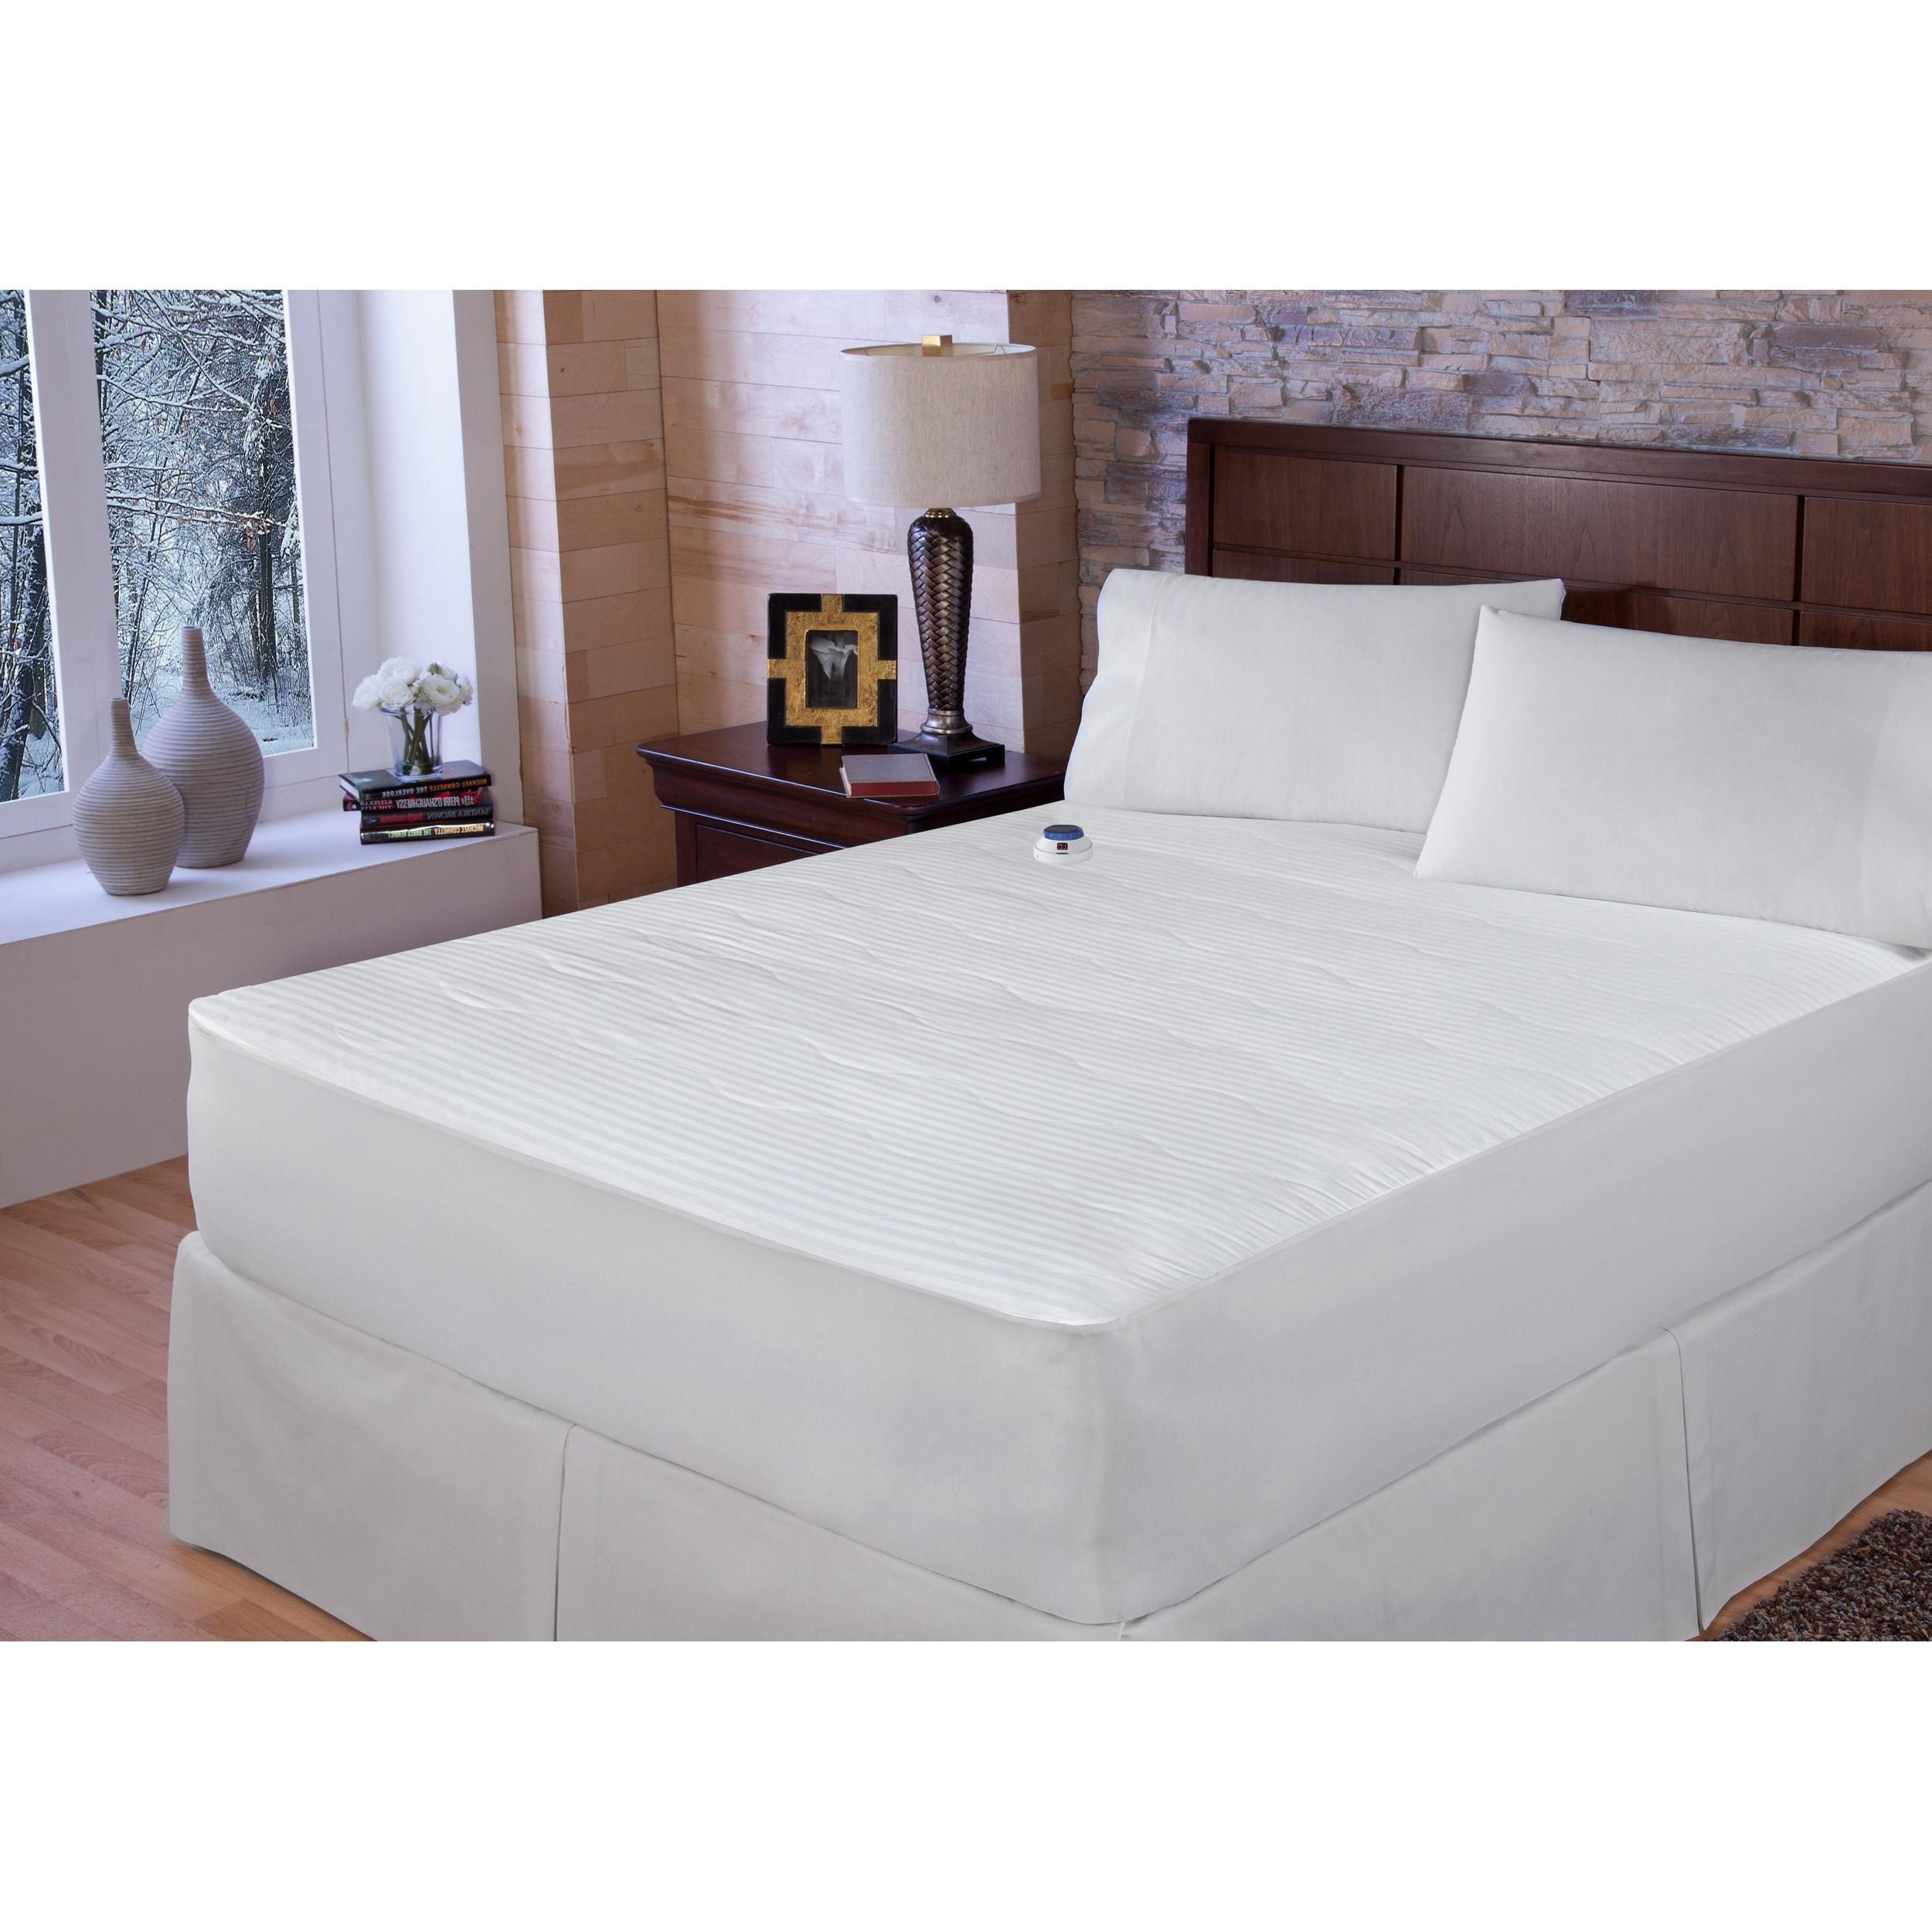 saatva com goodbed mattress restonic picture reviews mattresses